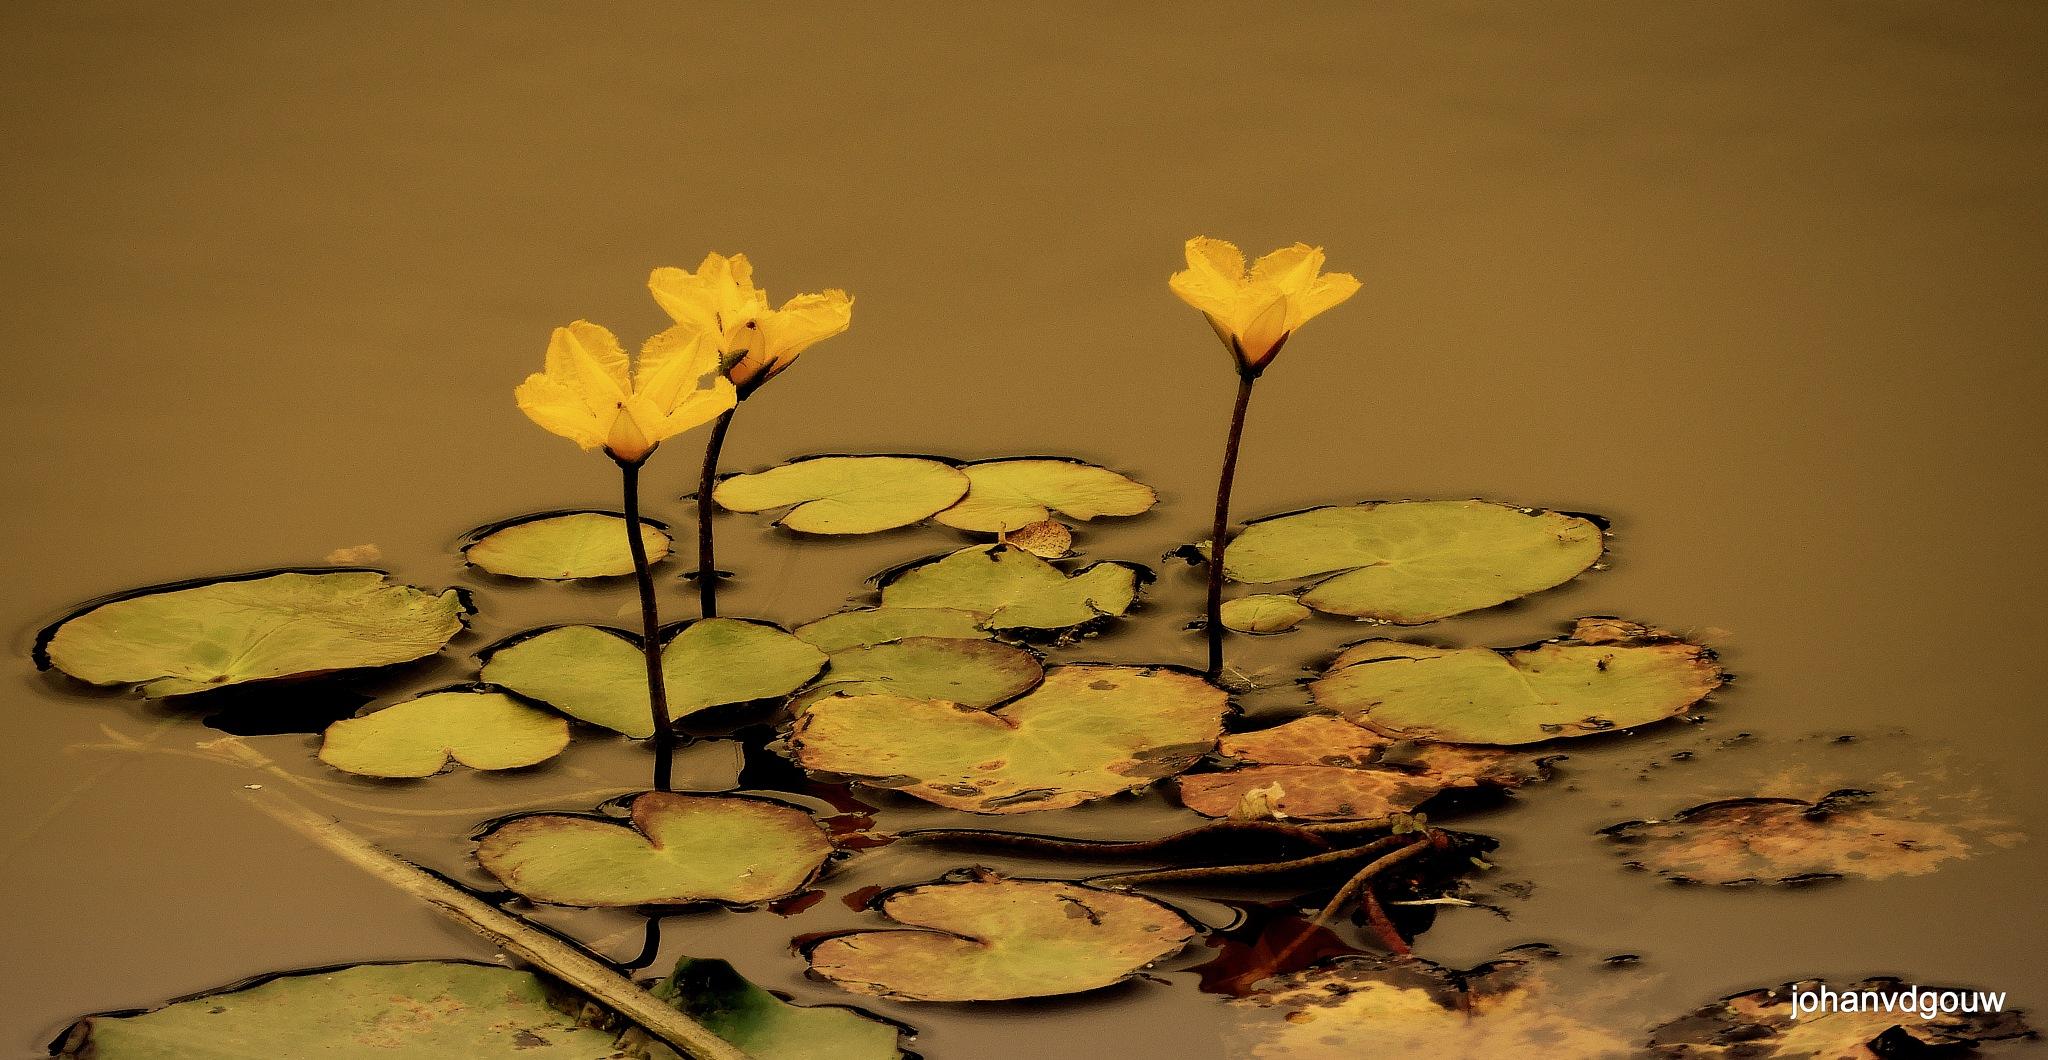 Aquatic plants by johan.vandergouw